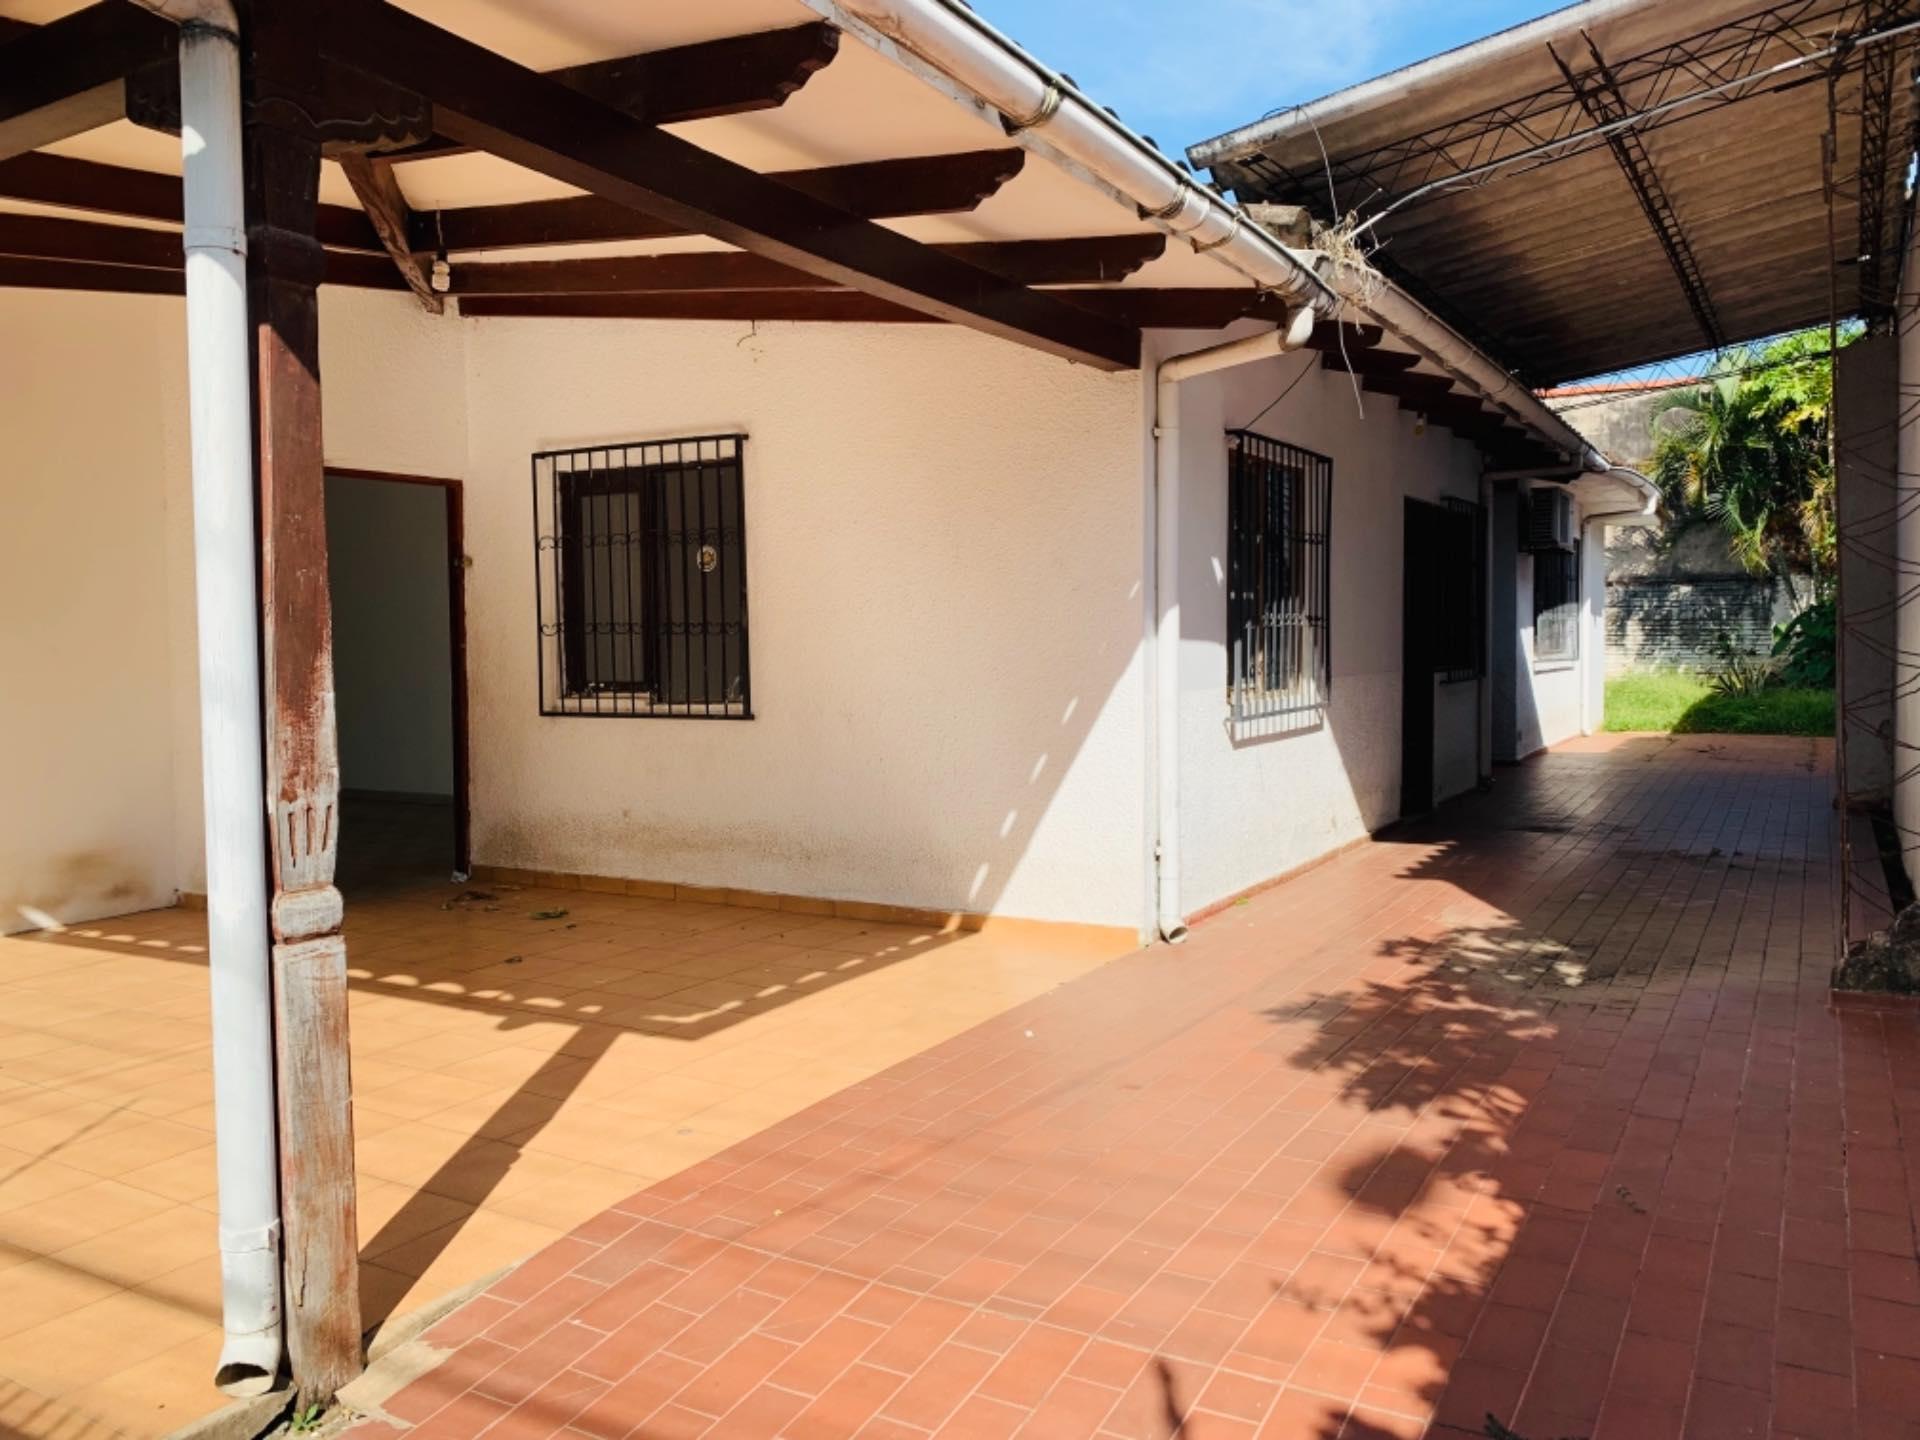 Casa en Alquiler Barrio Equipetrol entre 3er y 4to Anillo Foto 7